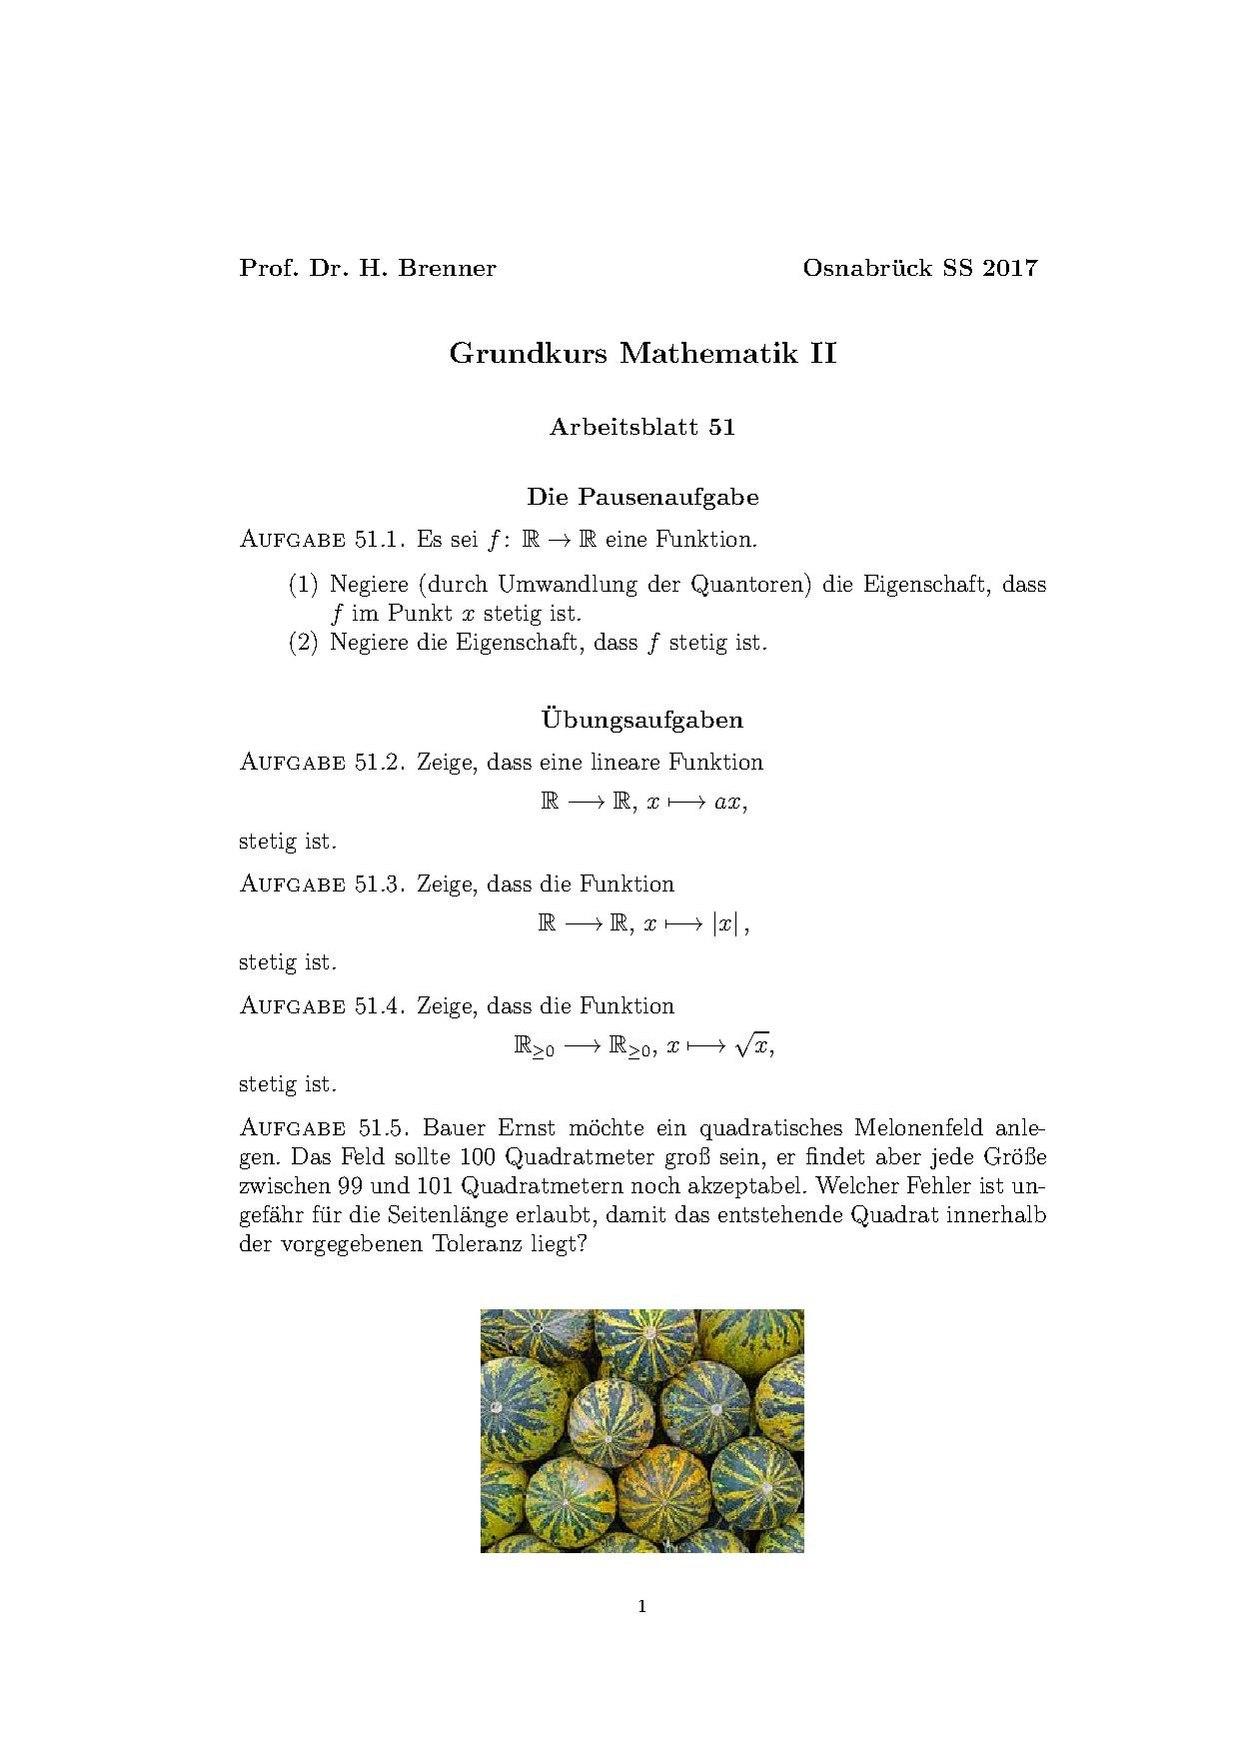 File:Grundkurs Mathematik (Osnabrück 2016-2017)Teil IIArbeitsblatt51 ...